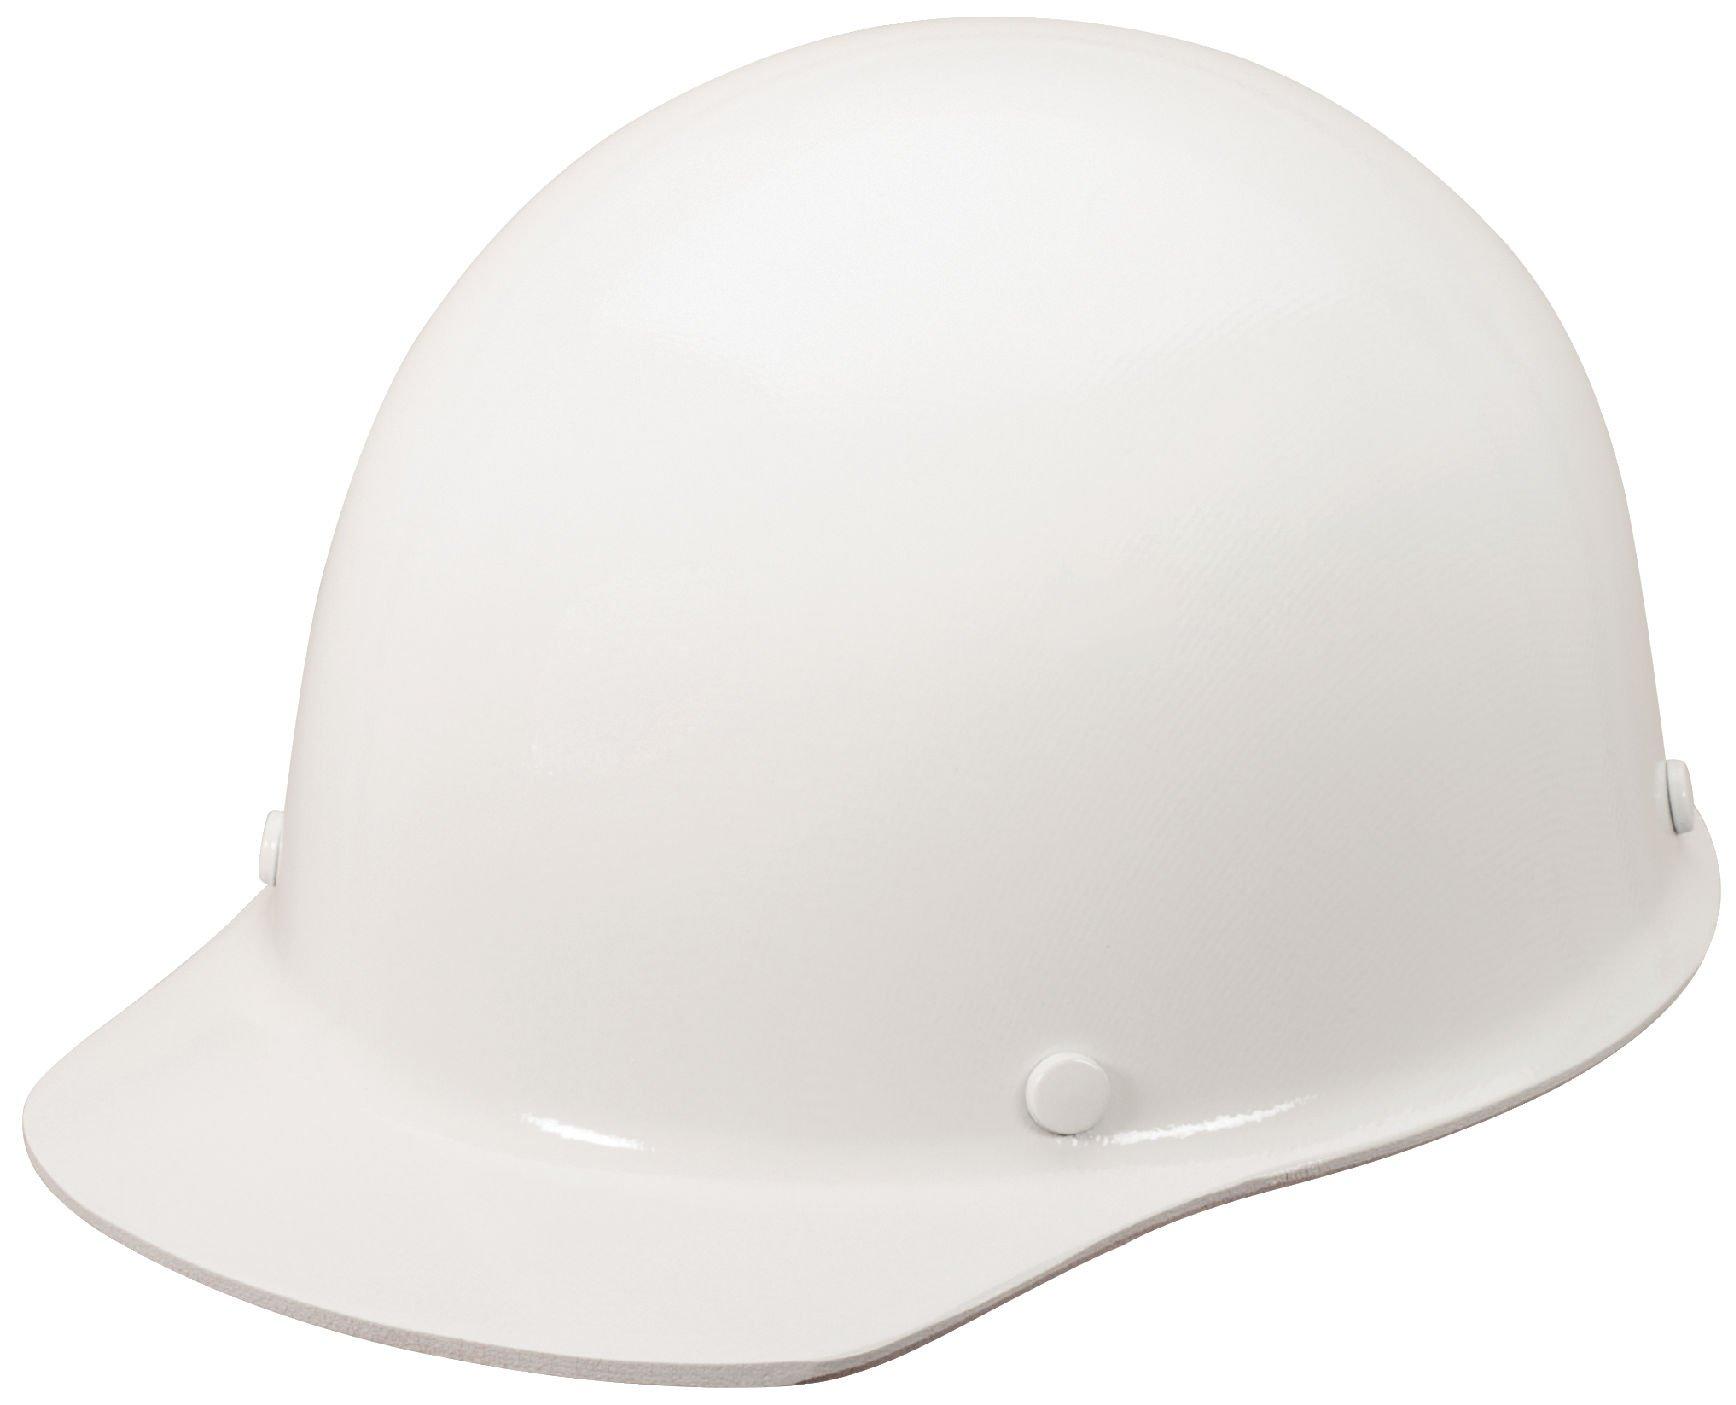 MSA Safety 10119699 Skullgard Protective Cap with Ratchet, Type B, Large Size, Strobe White